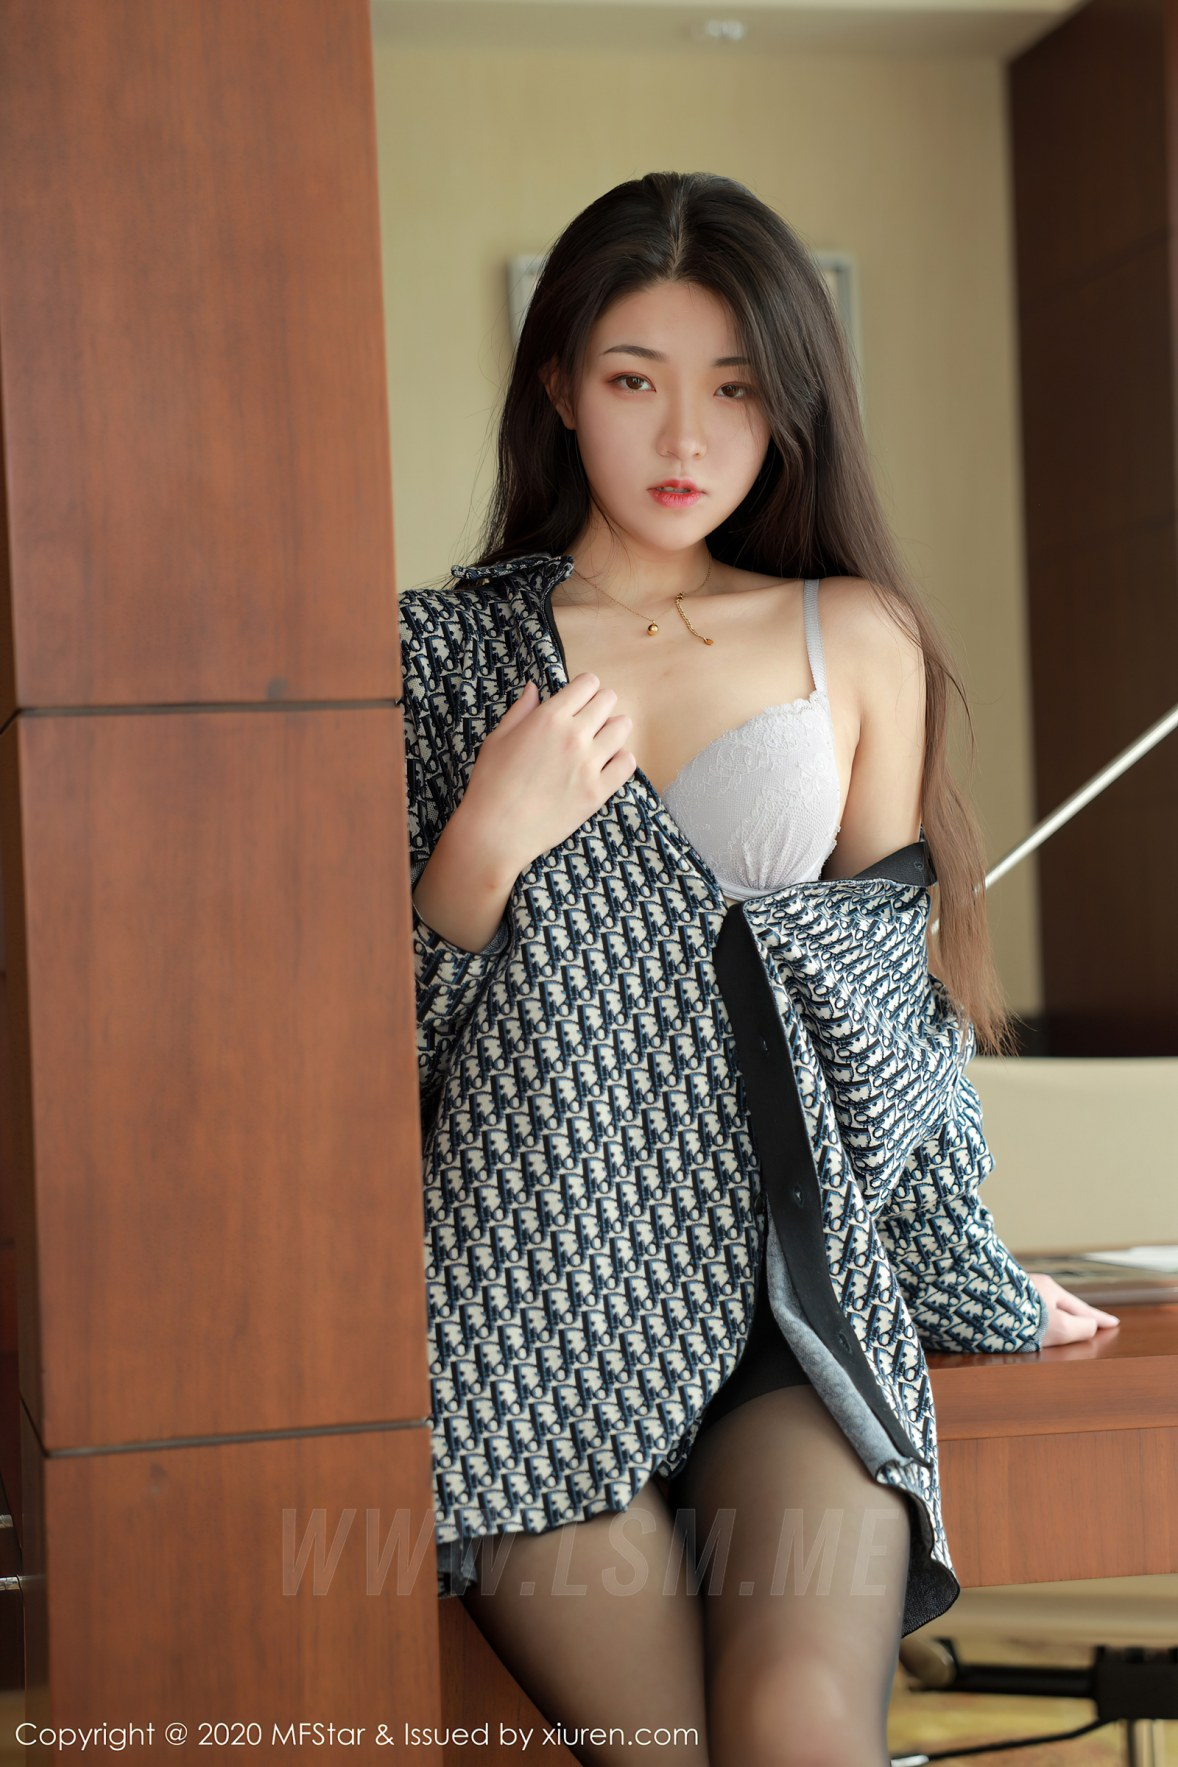 MFStar 模范学院 Vol.374  格子衬衫与黑丝细腿 苏雨彤 - 3